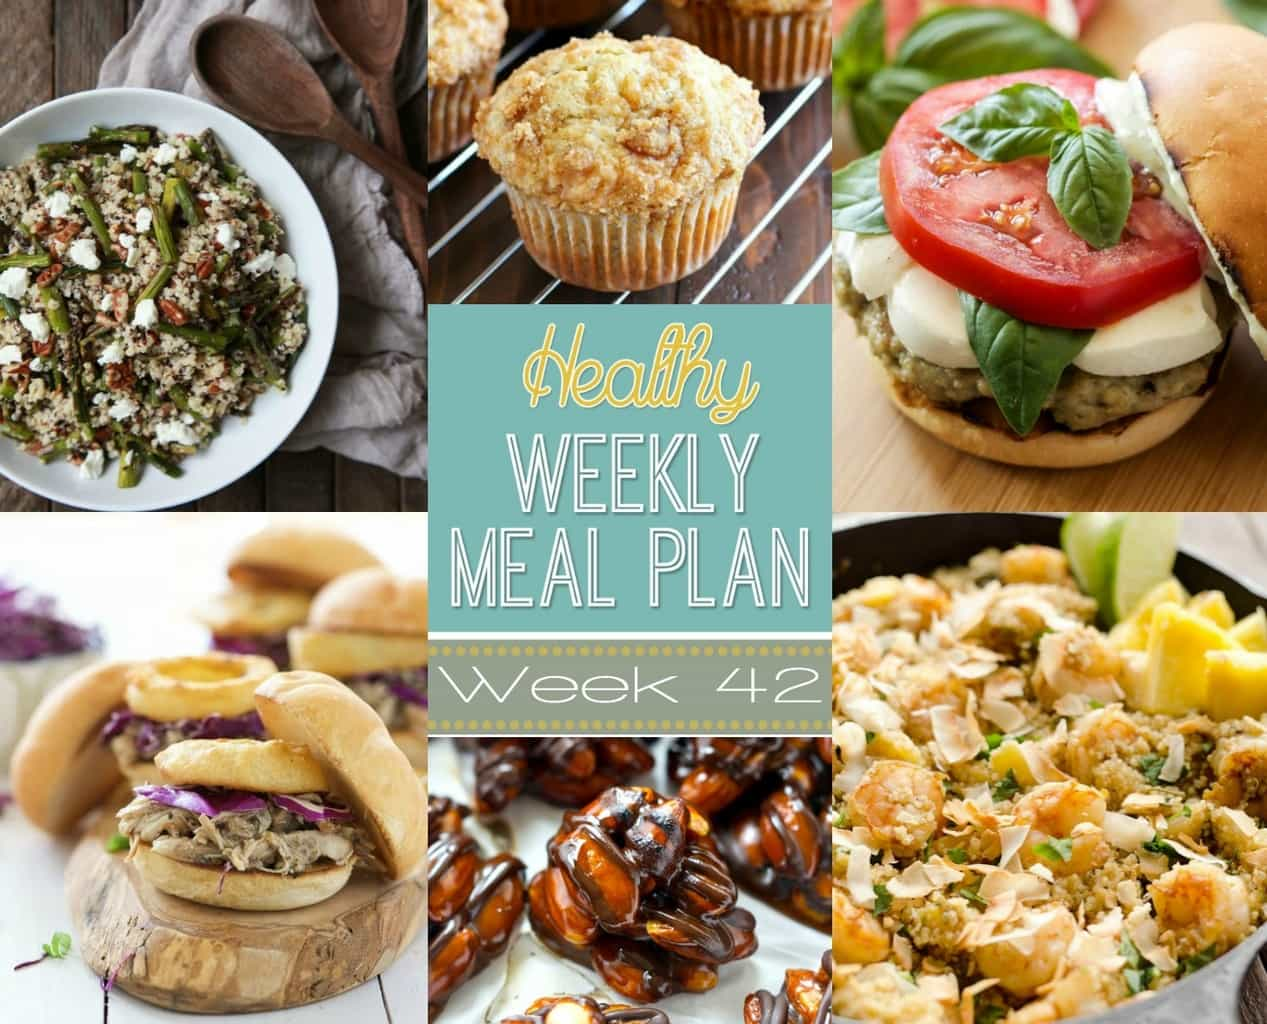 Healthy Weekly Meal Plan 42